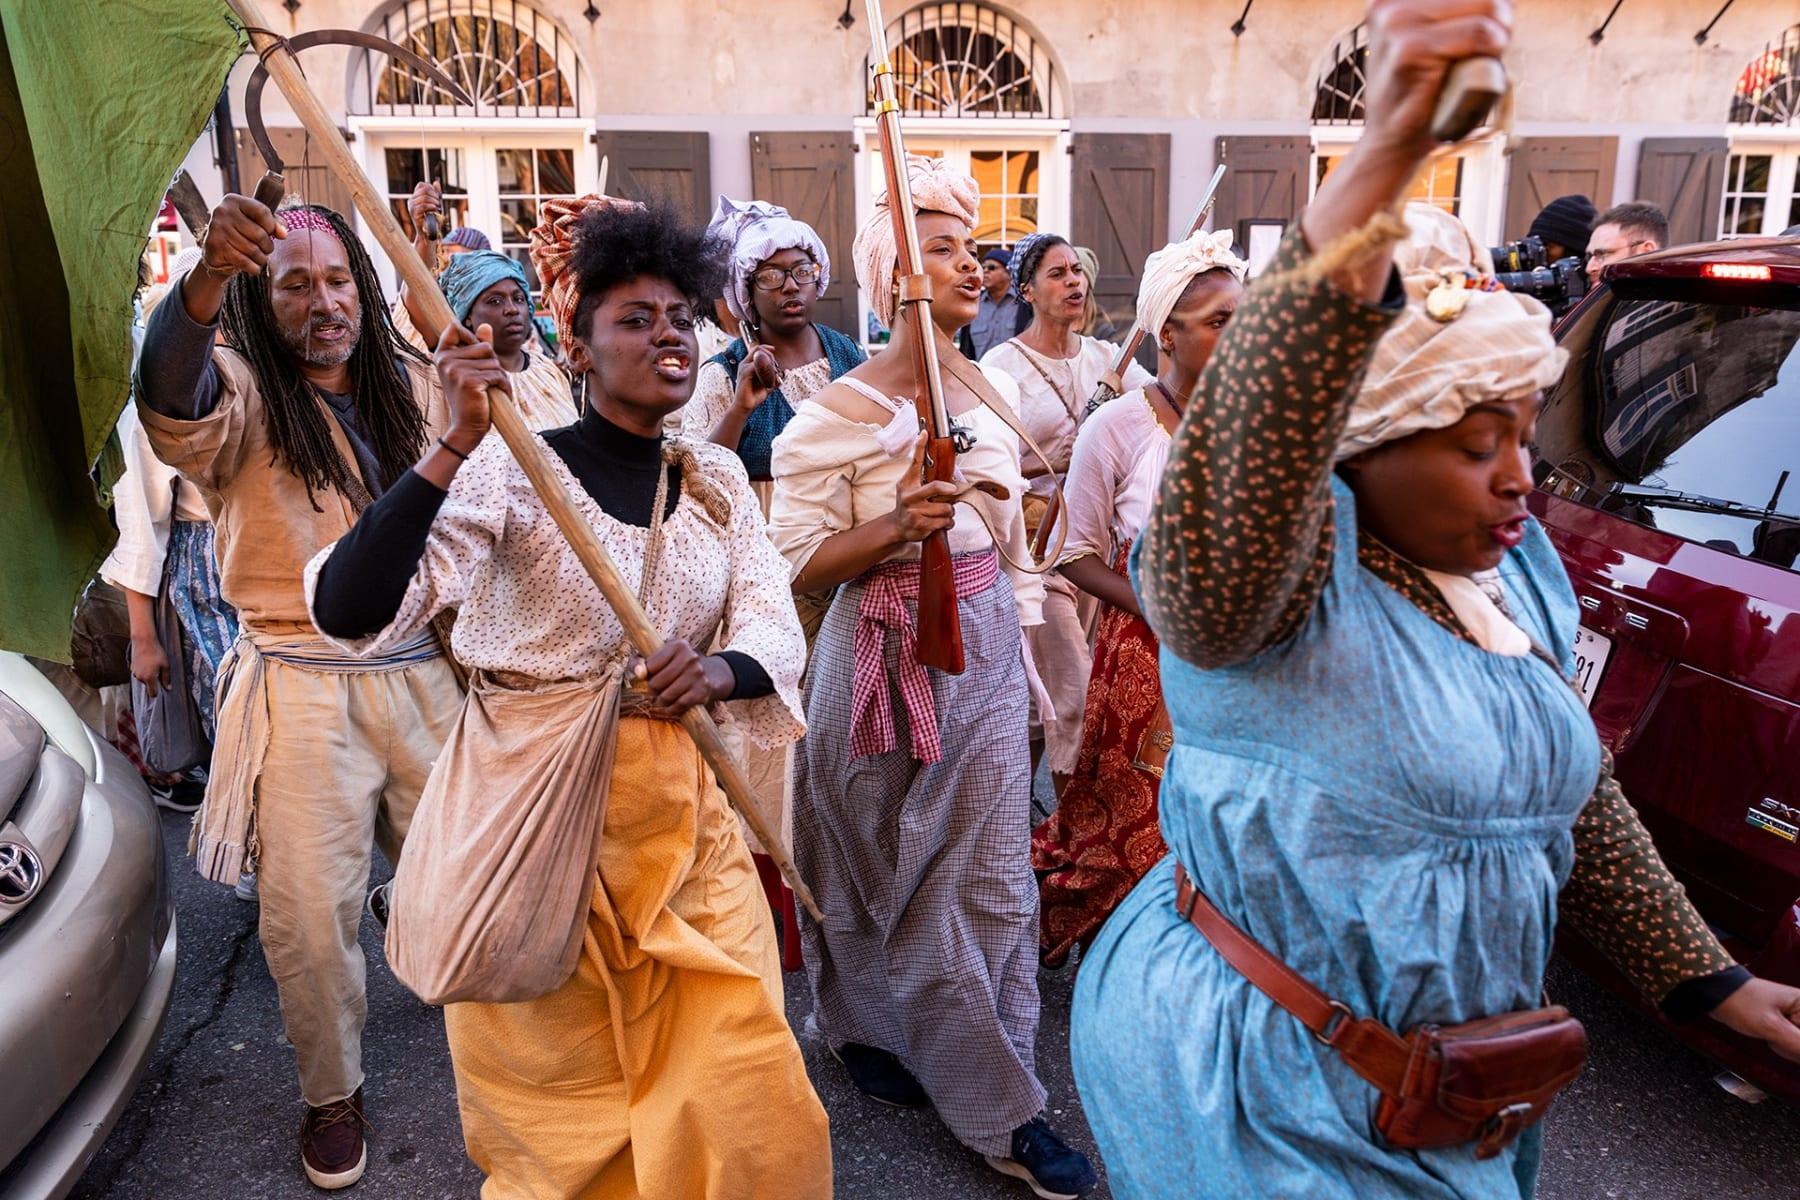 Dread Scott, Slave Rebellion Reenactment Performance Still 5, 2019